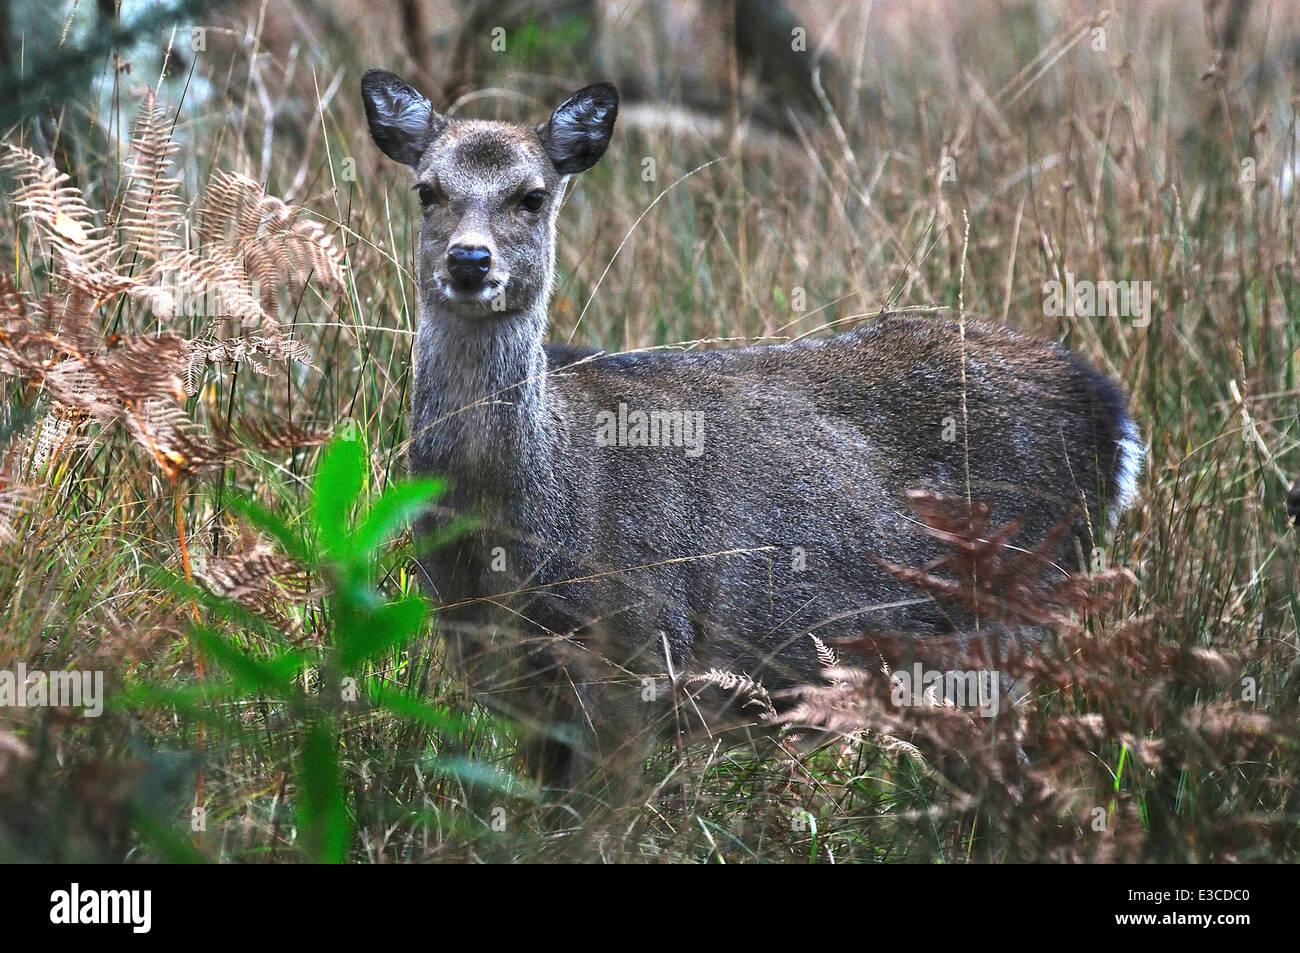 Sika Hirsch Cervus Nippon Säugetier Säugetiere Tier wilde Tierwelt Natur Stockbild